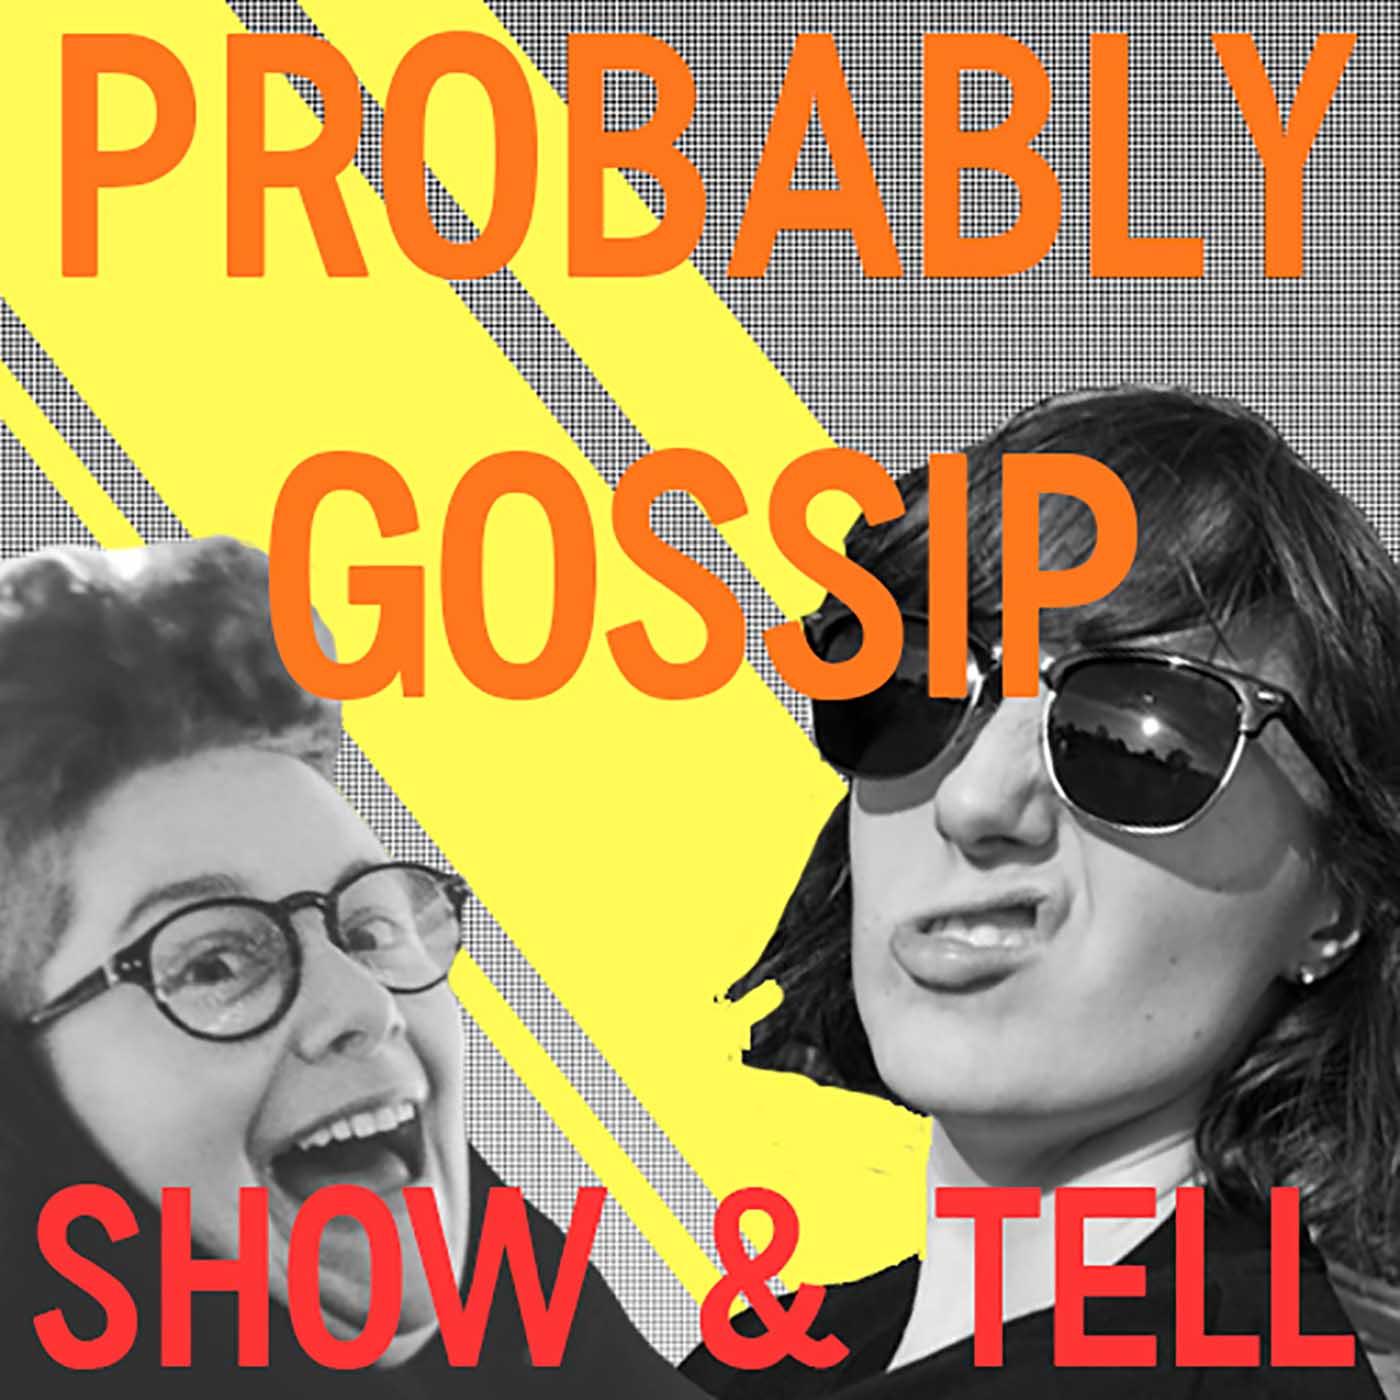 Probably Gossip